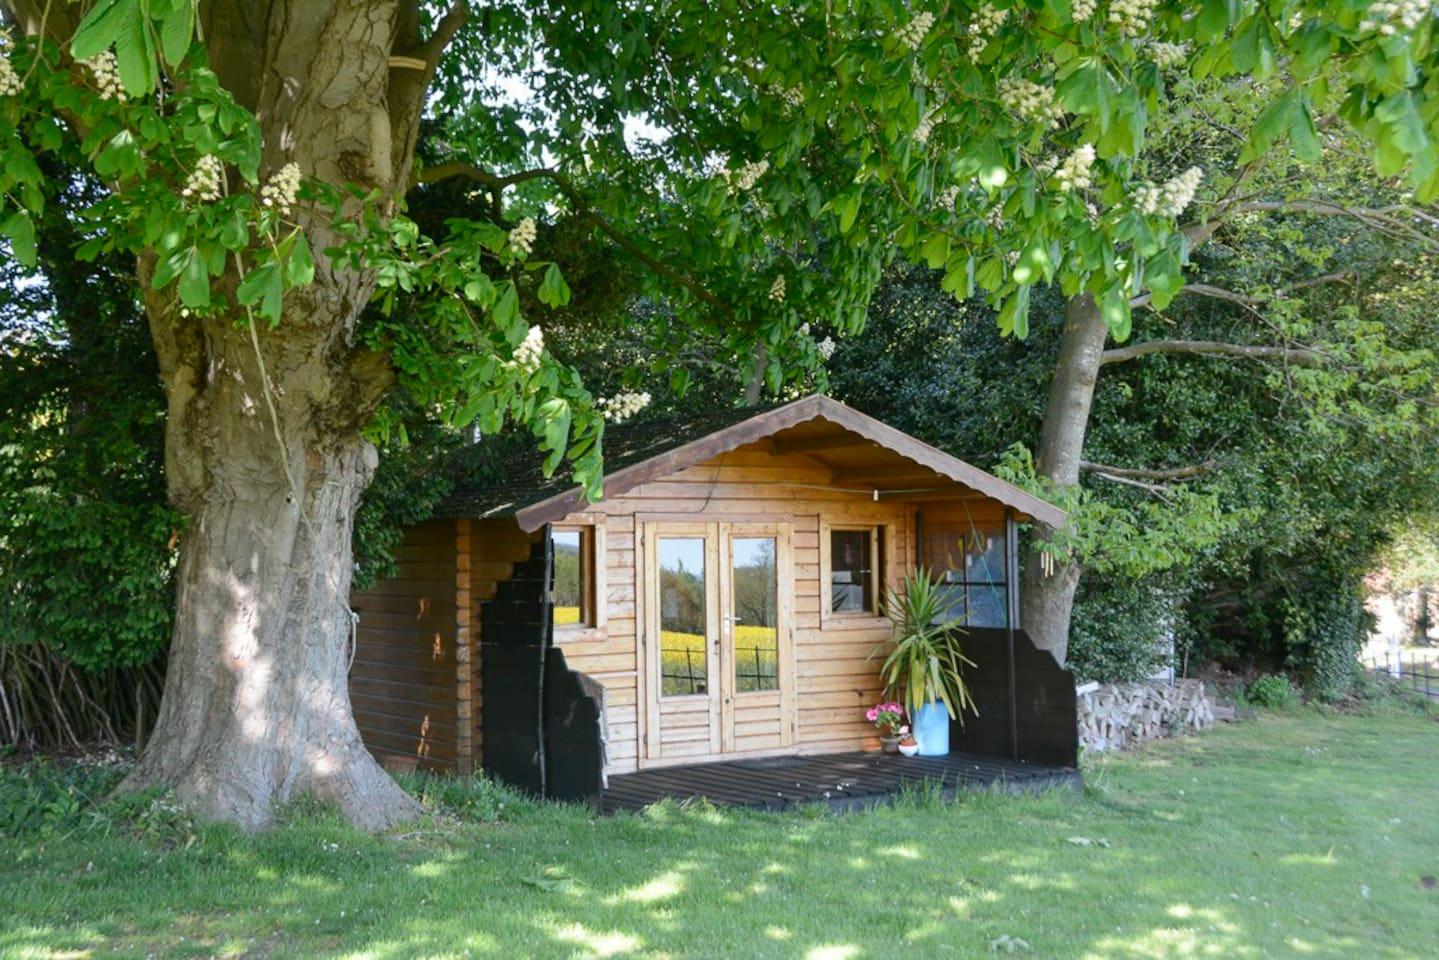 Delightful cabin in beautiful surrounds